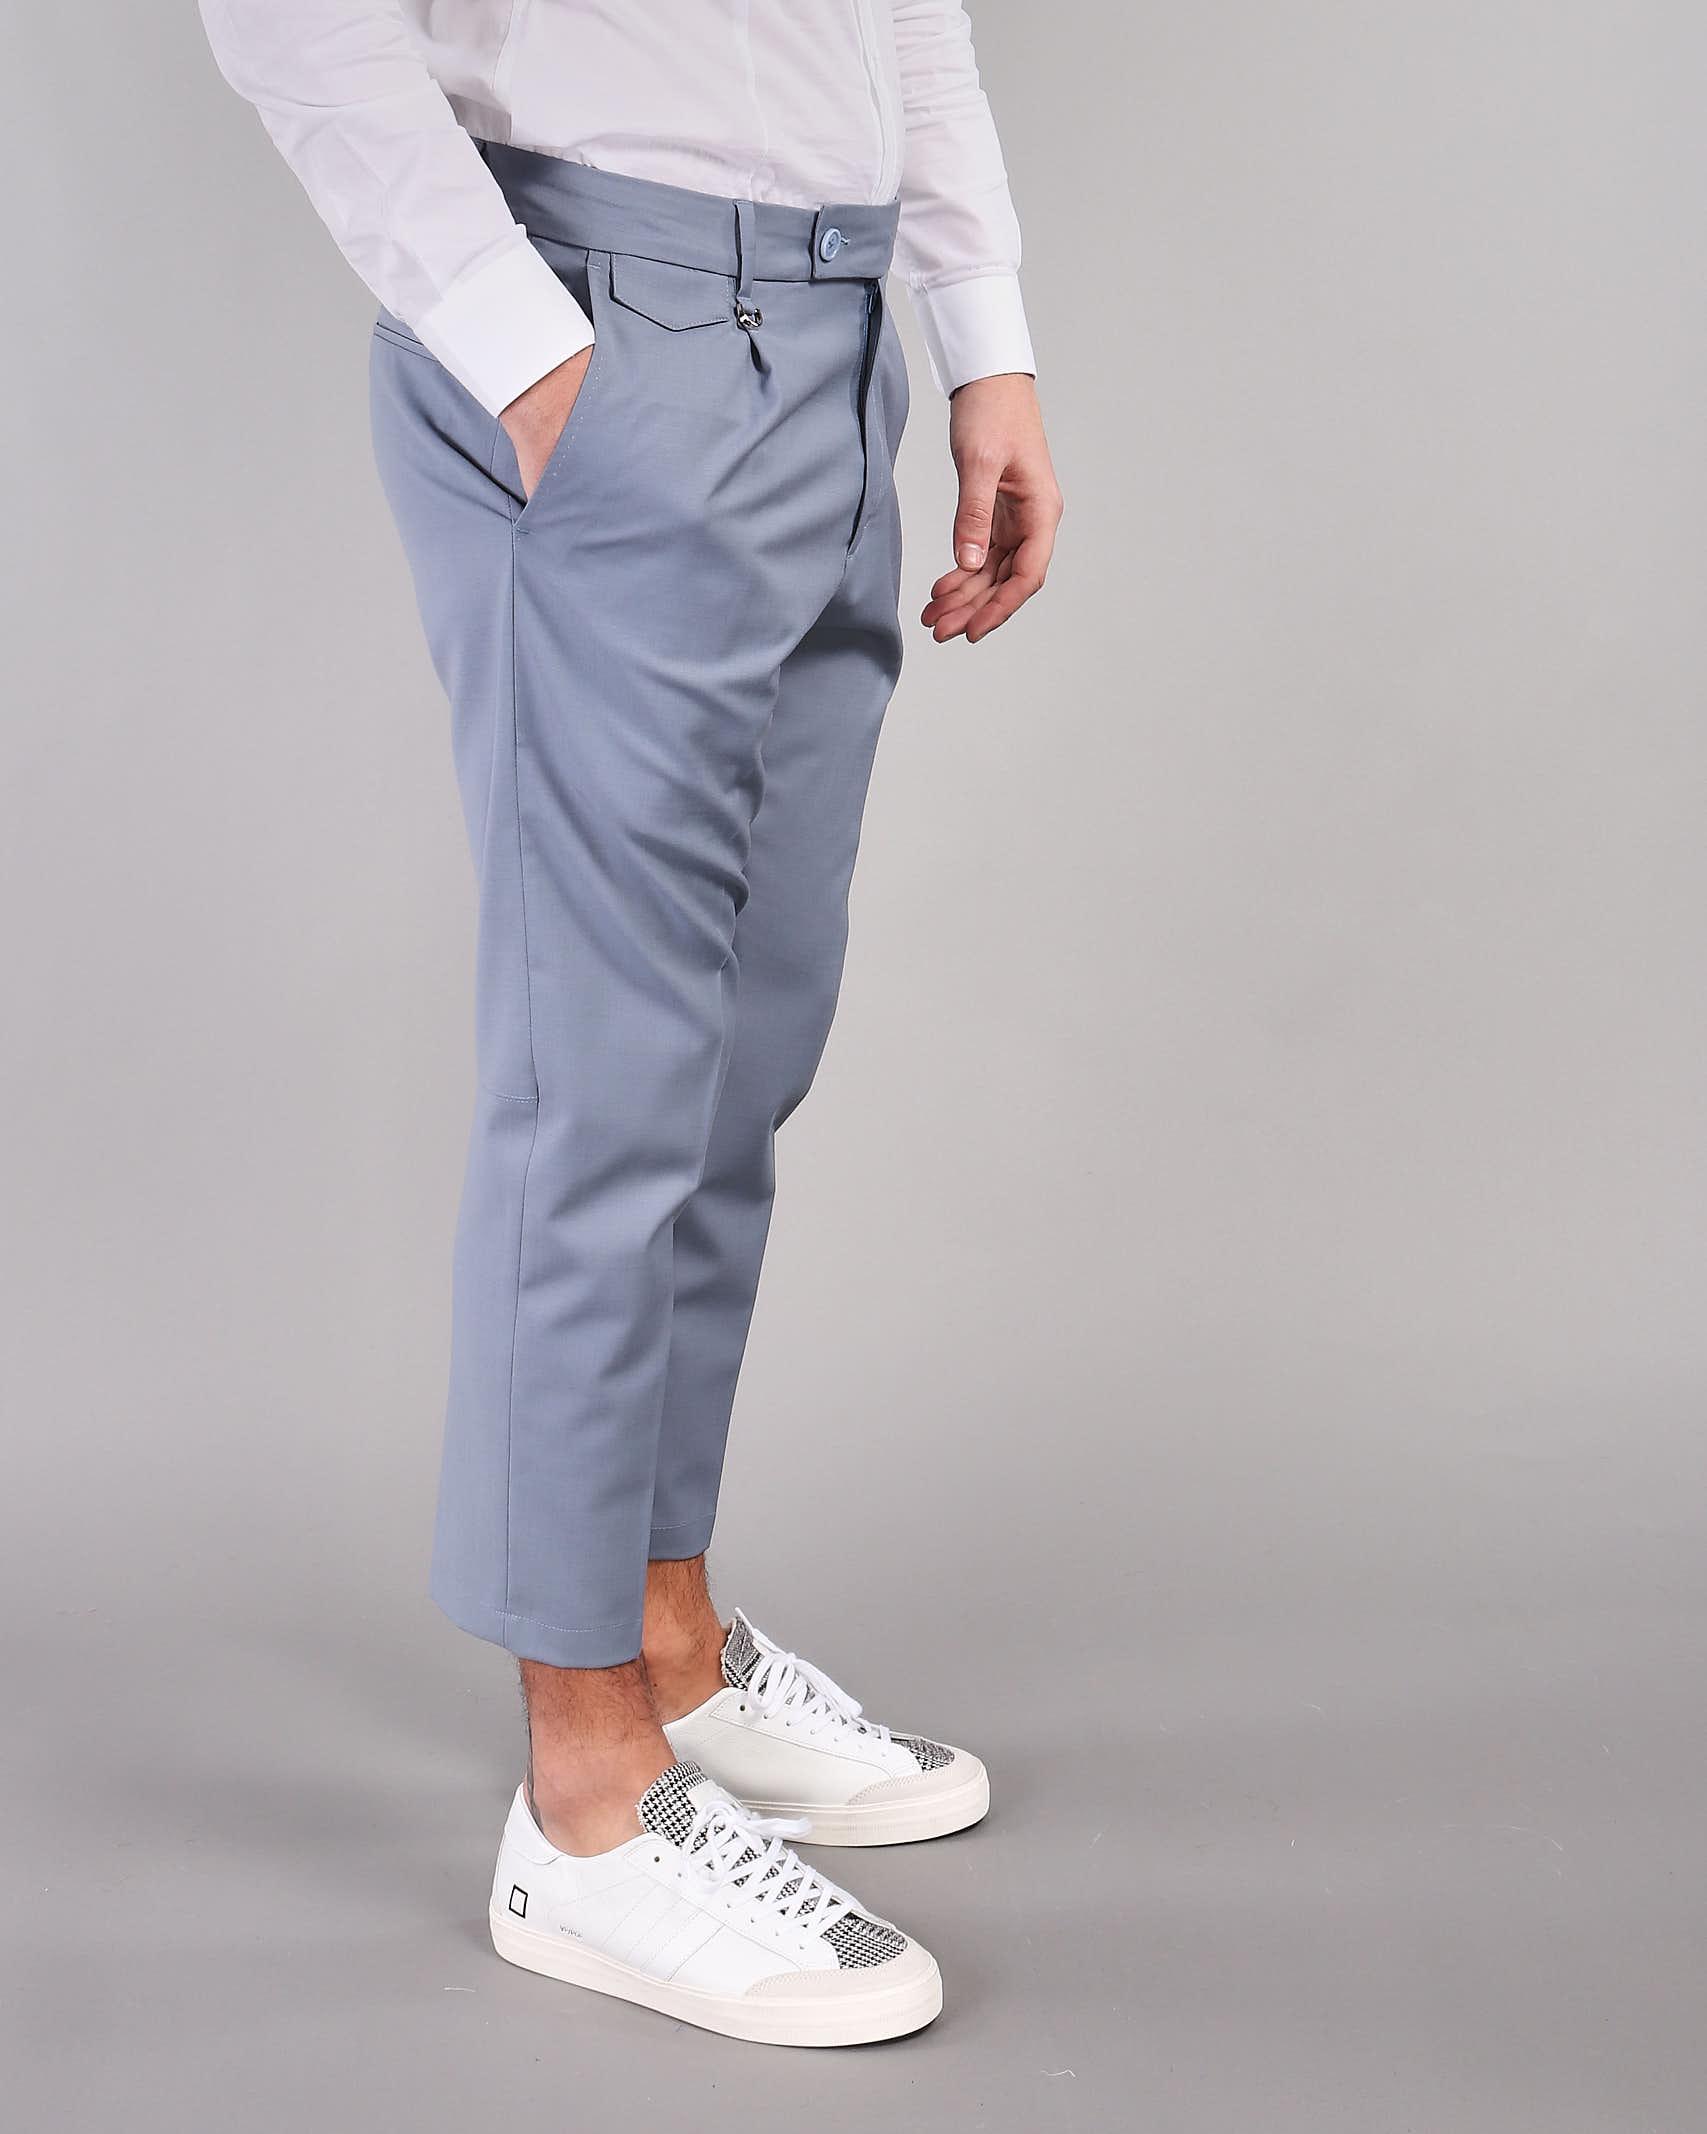 Pantalone capri Golden Craft GOLDEN CRAFT | Pantalone | GC1PSS215890E061